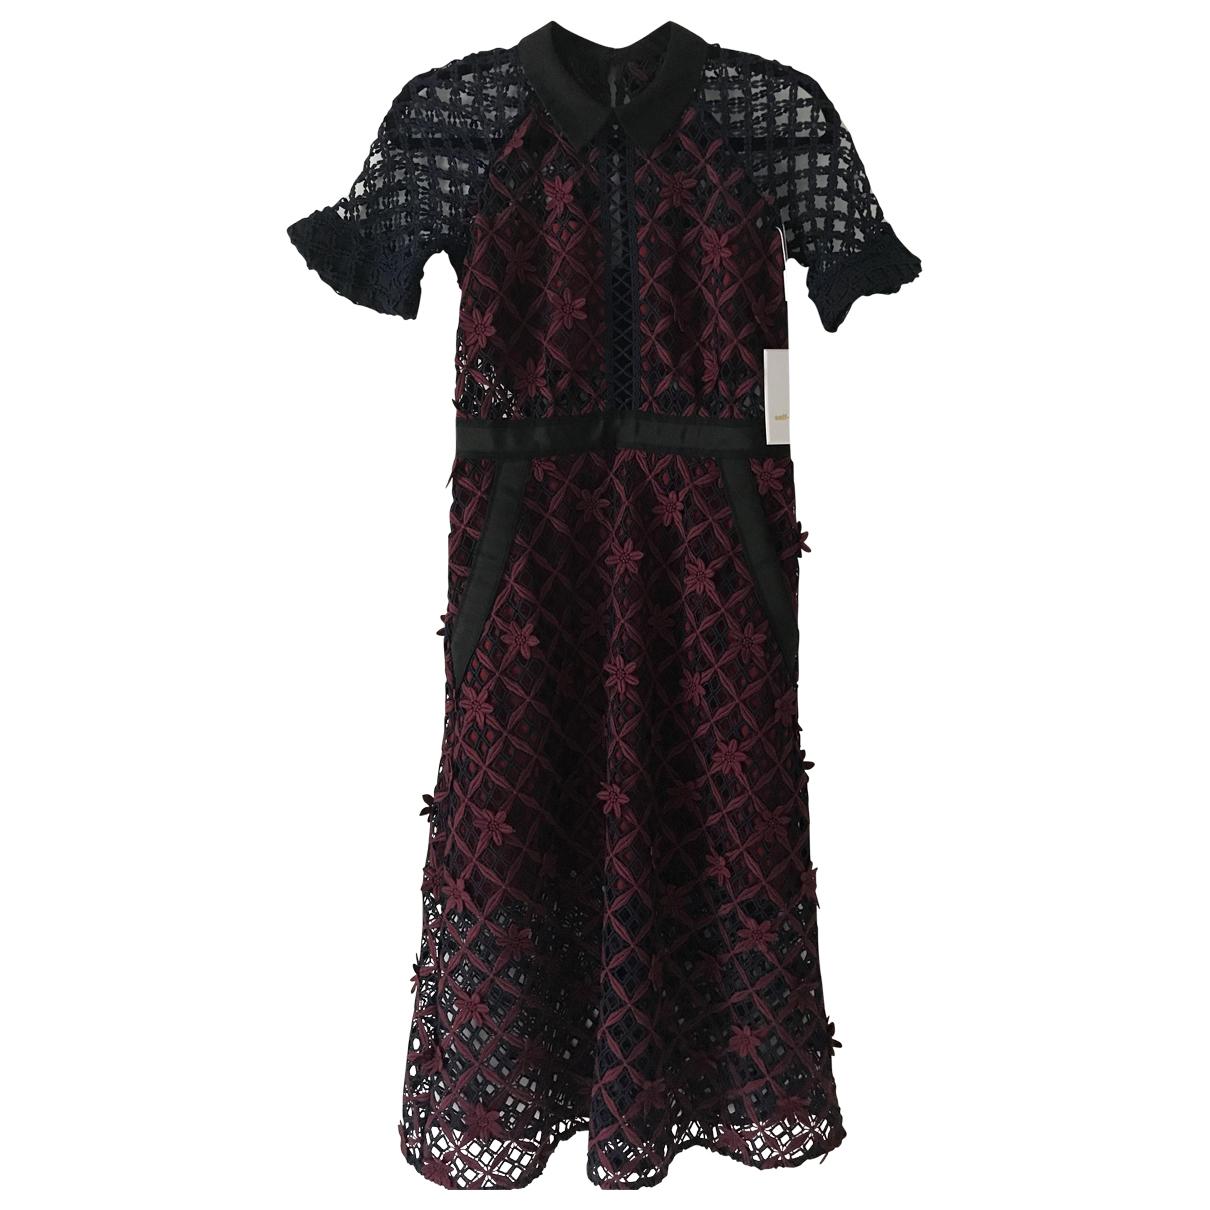 Self Portrait \N Burgundy Lace dress for Women 10 UK